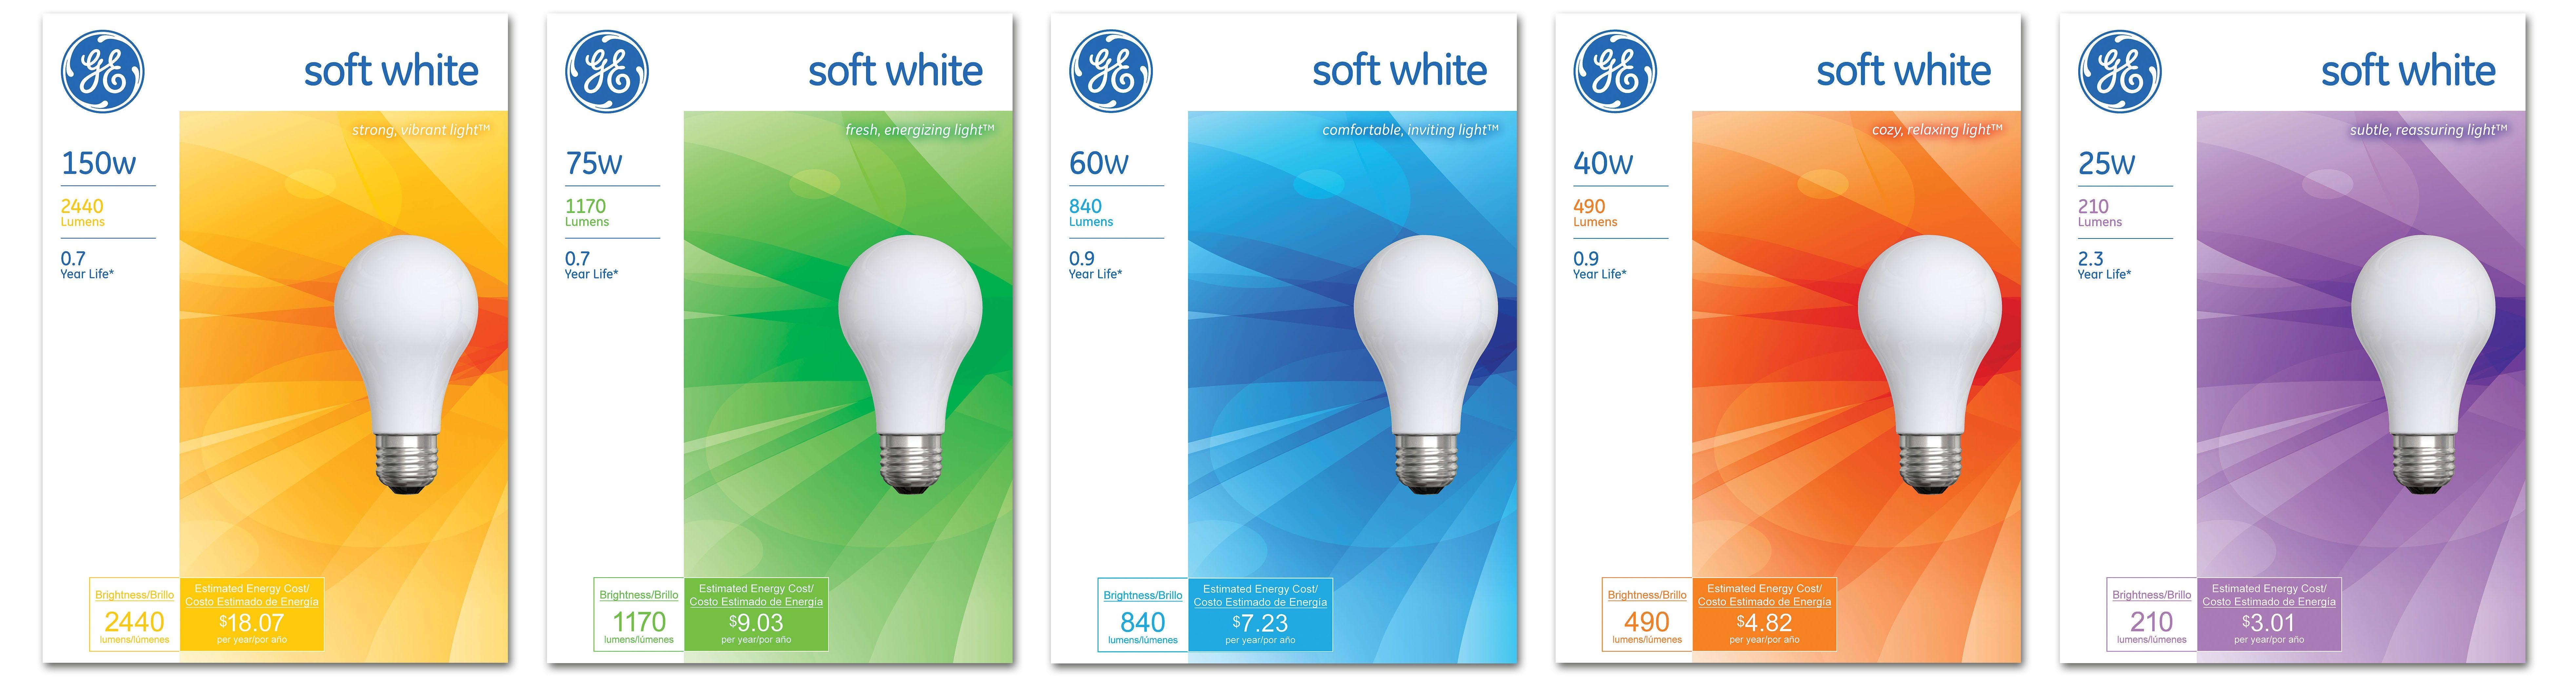 Ge Light Bulbs Catalog Automotive Light Bulbs Packing Design Bulb